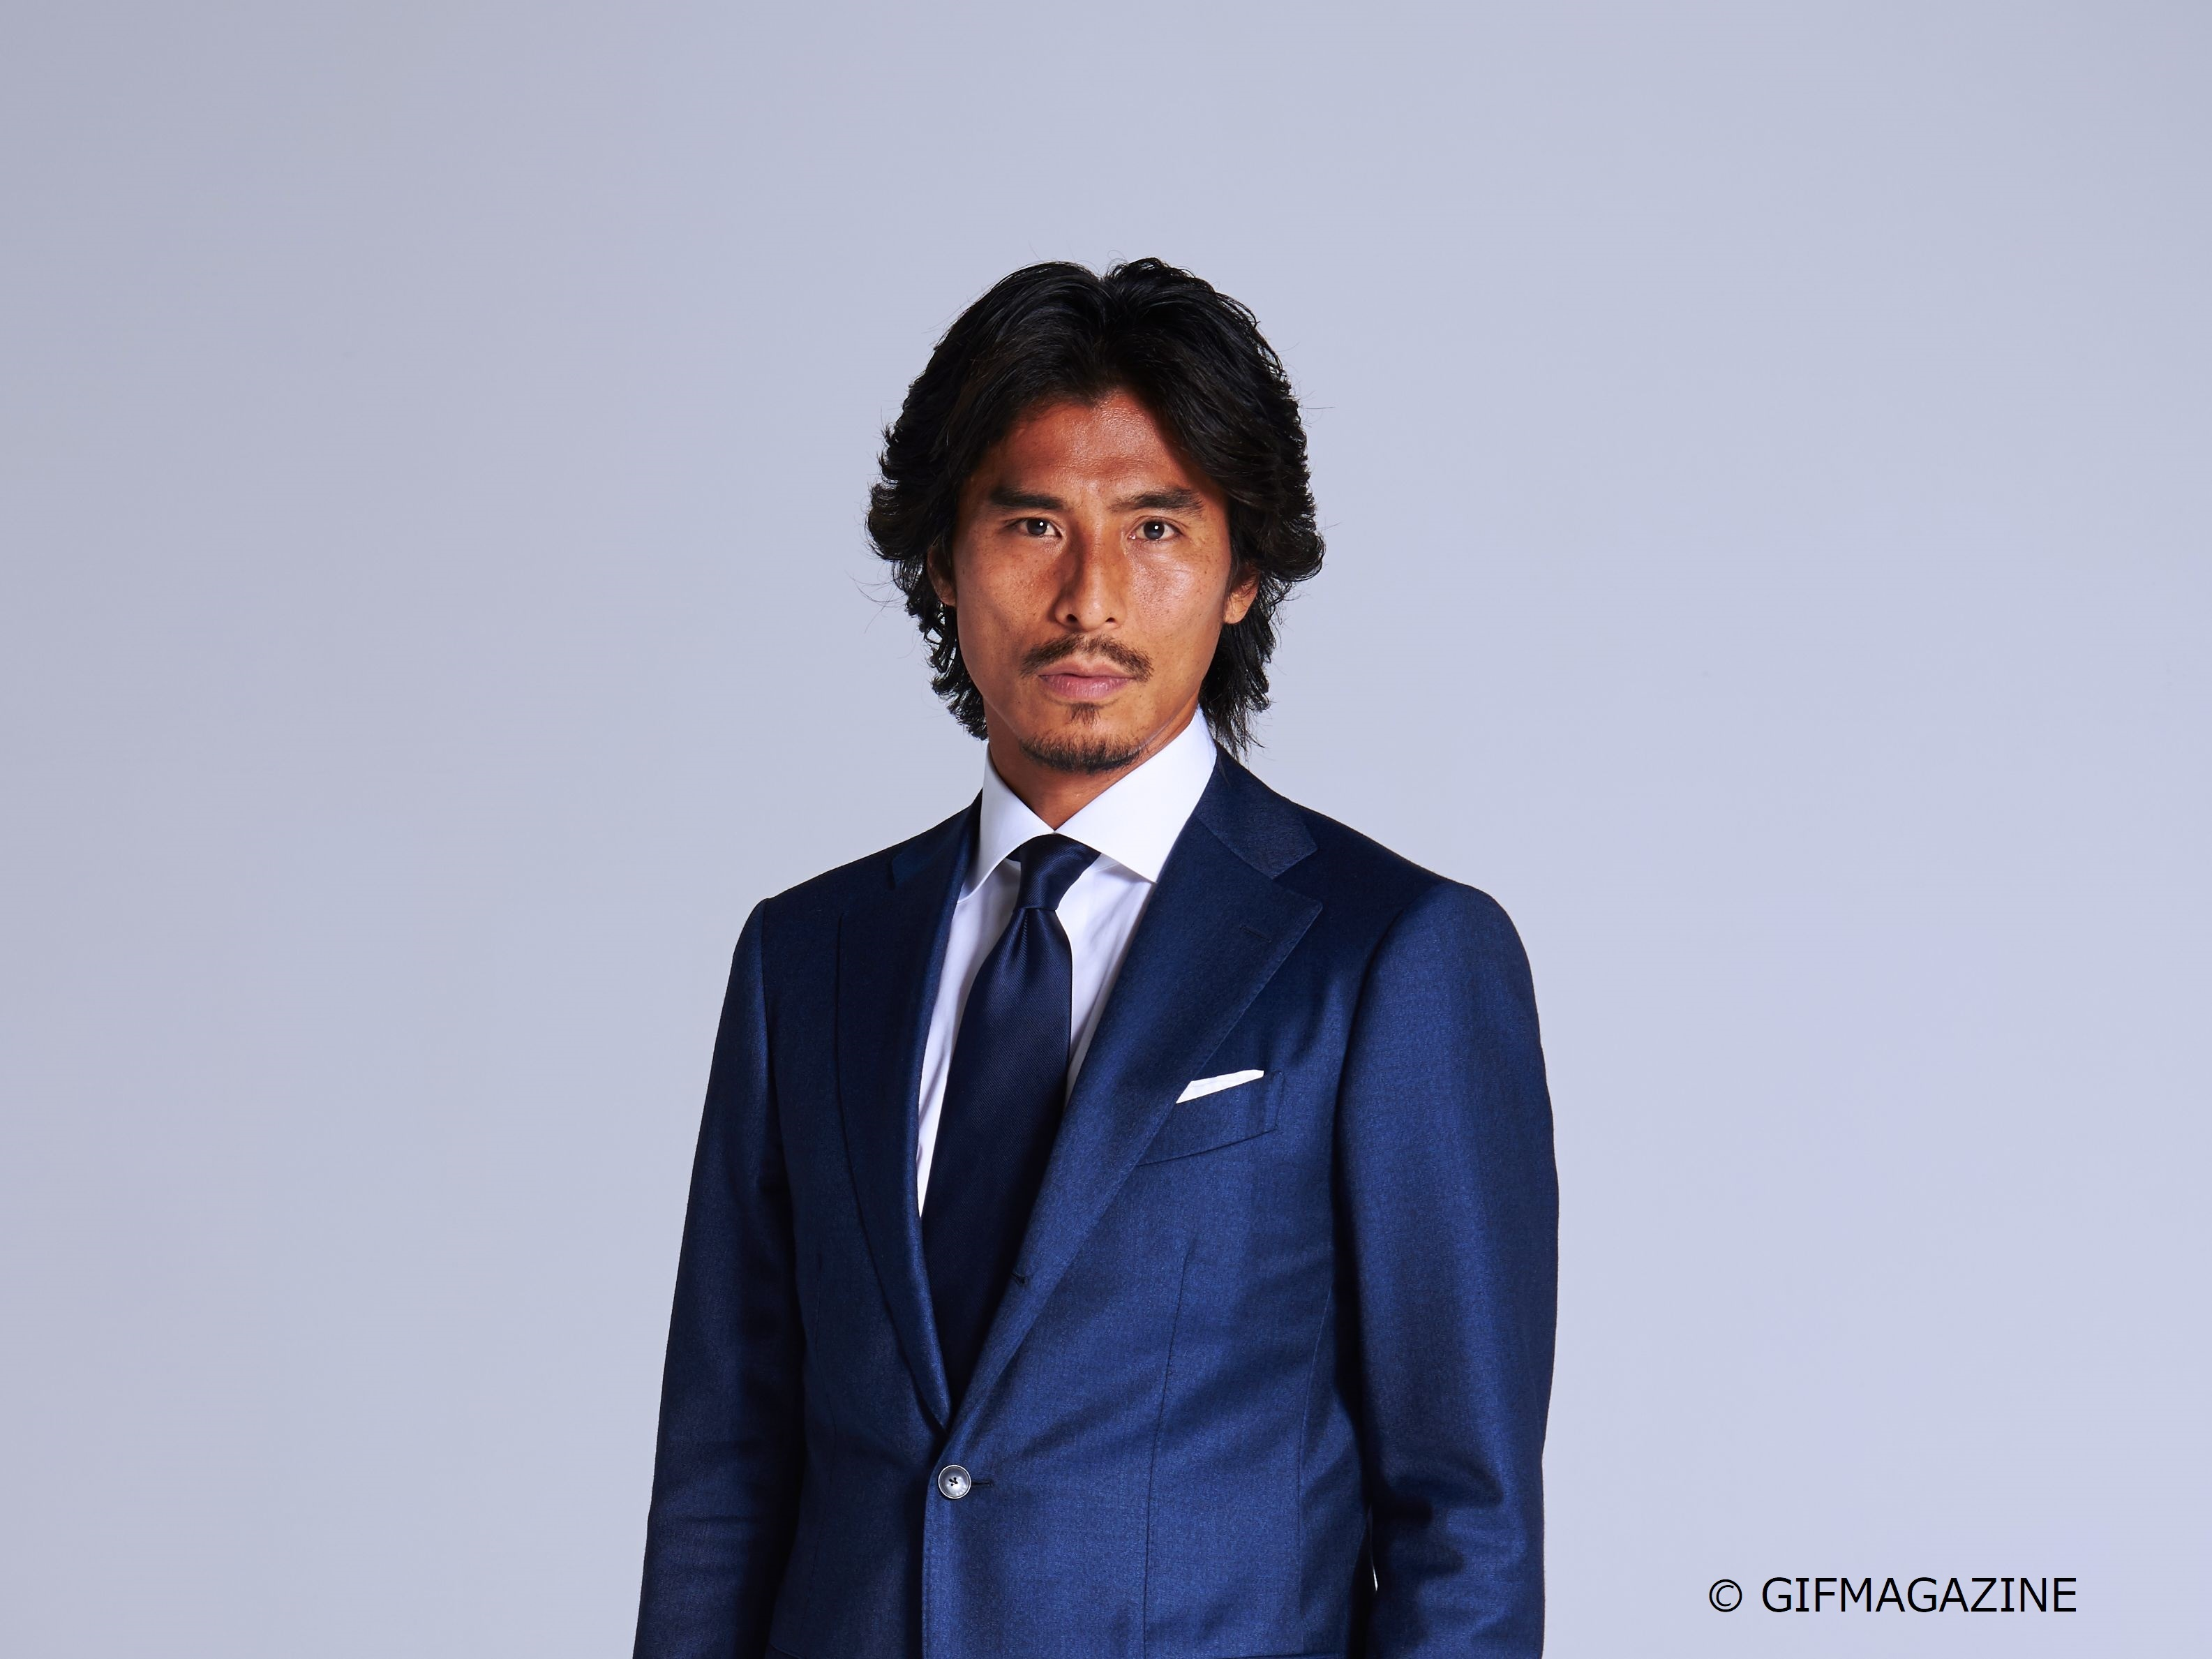 『AKASAKA e-LOUNGE~アスリートの言葉が明日を変える~』の初回ゲストは、サッカー元日本代表の中澤佑二氏